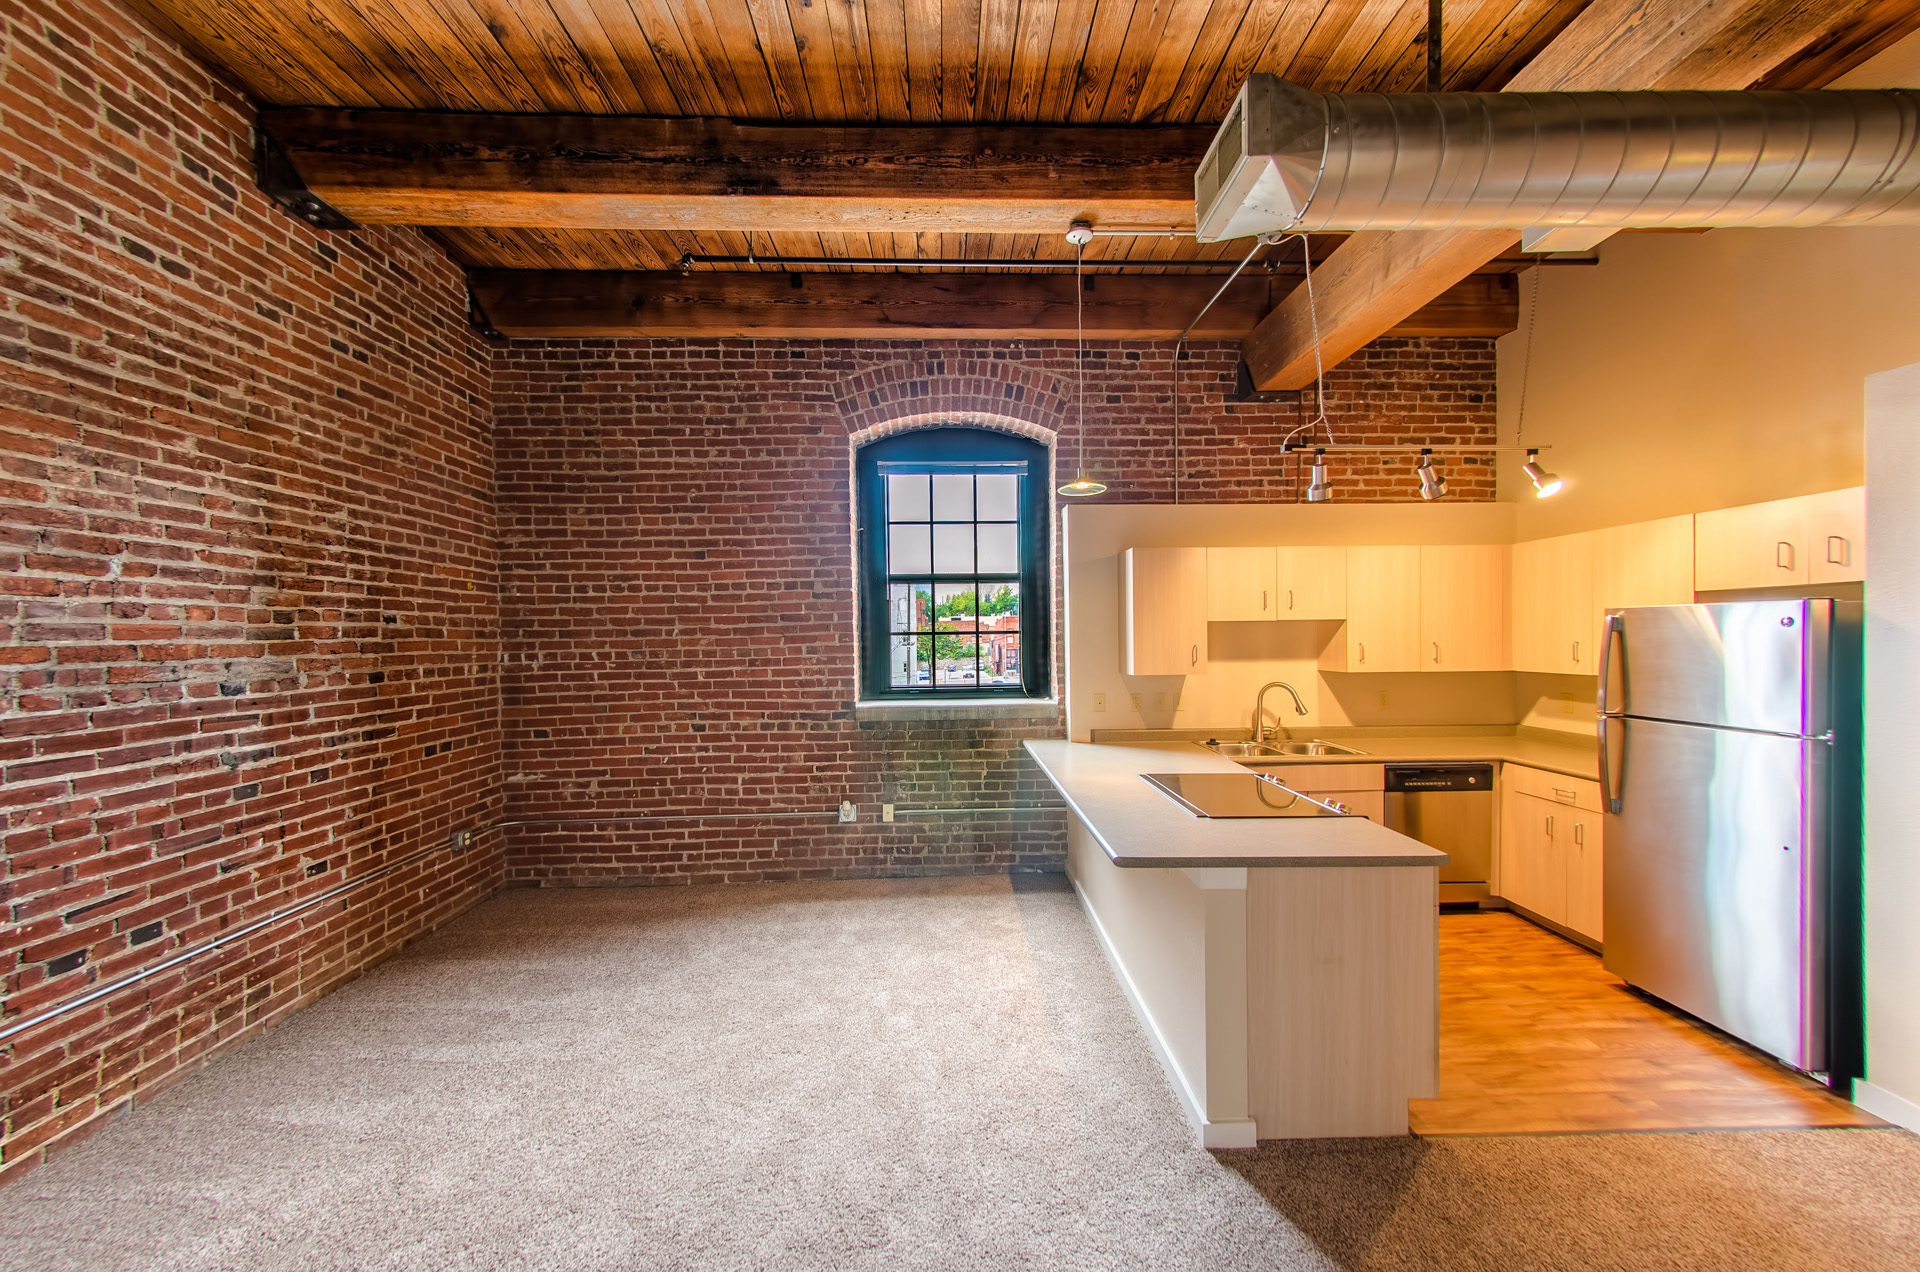 Featured For Rent Ebt 306 Kansas City Lofts Condos